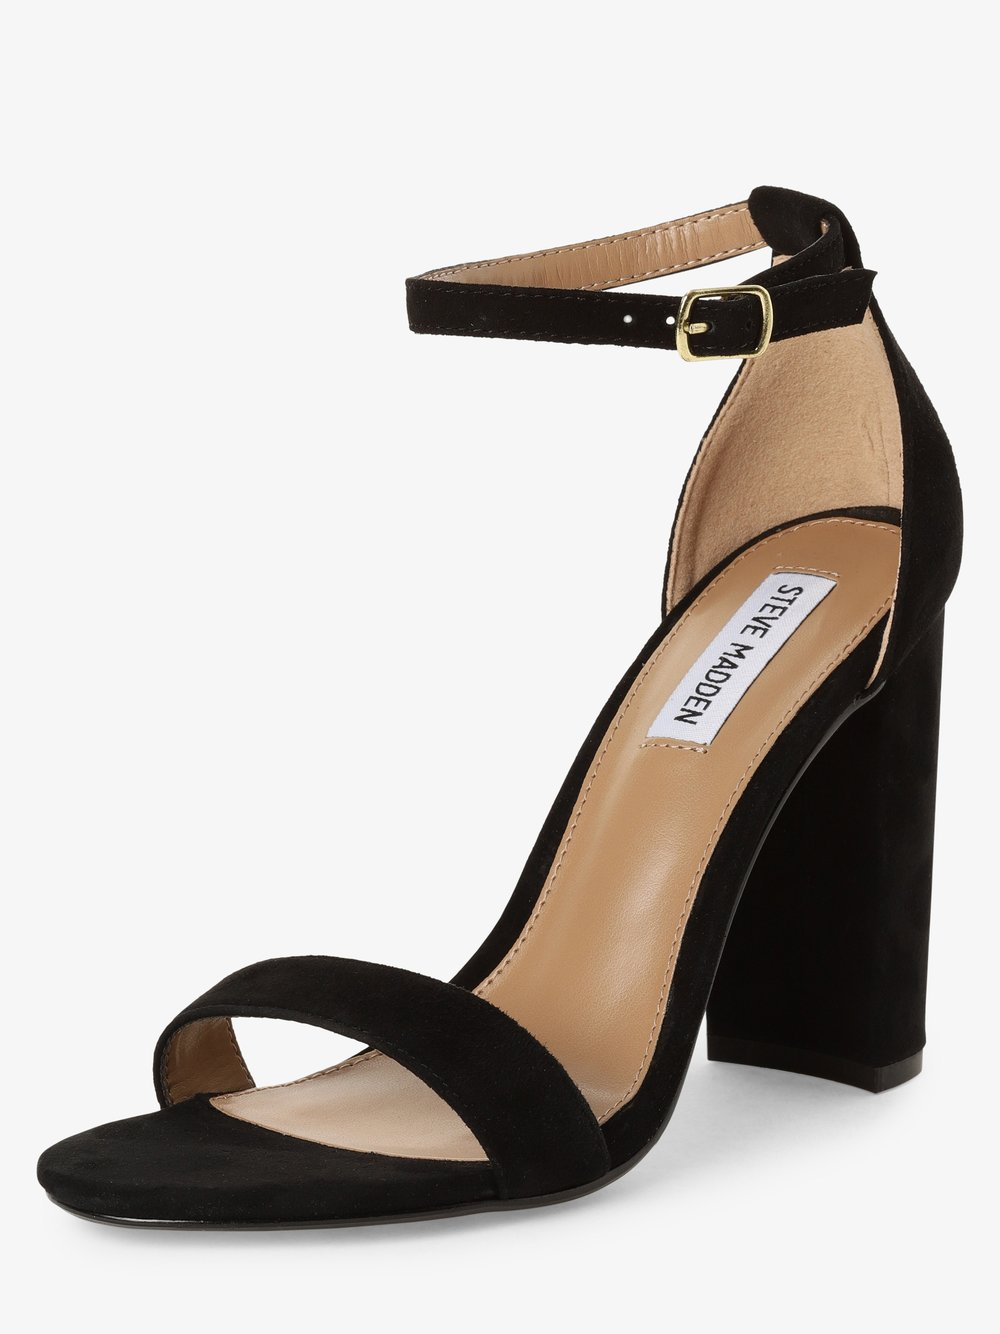 Steve Madden - Damskie sandały – Carrson, czarny